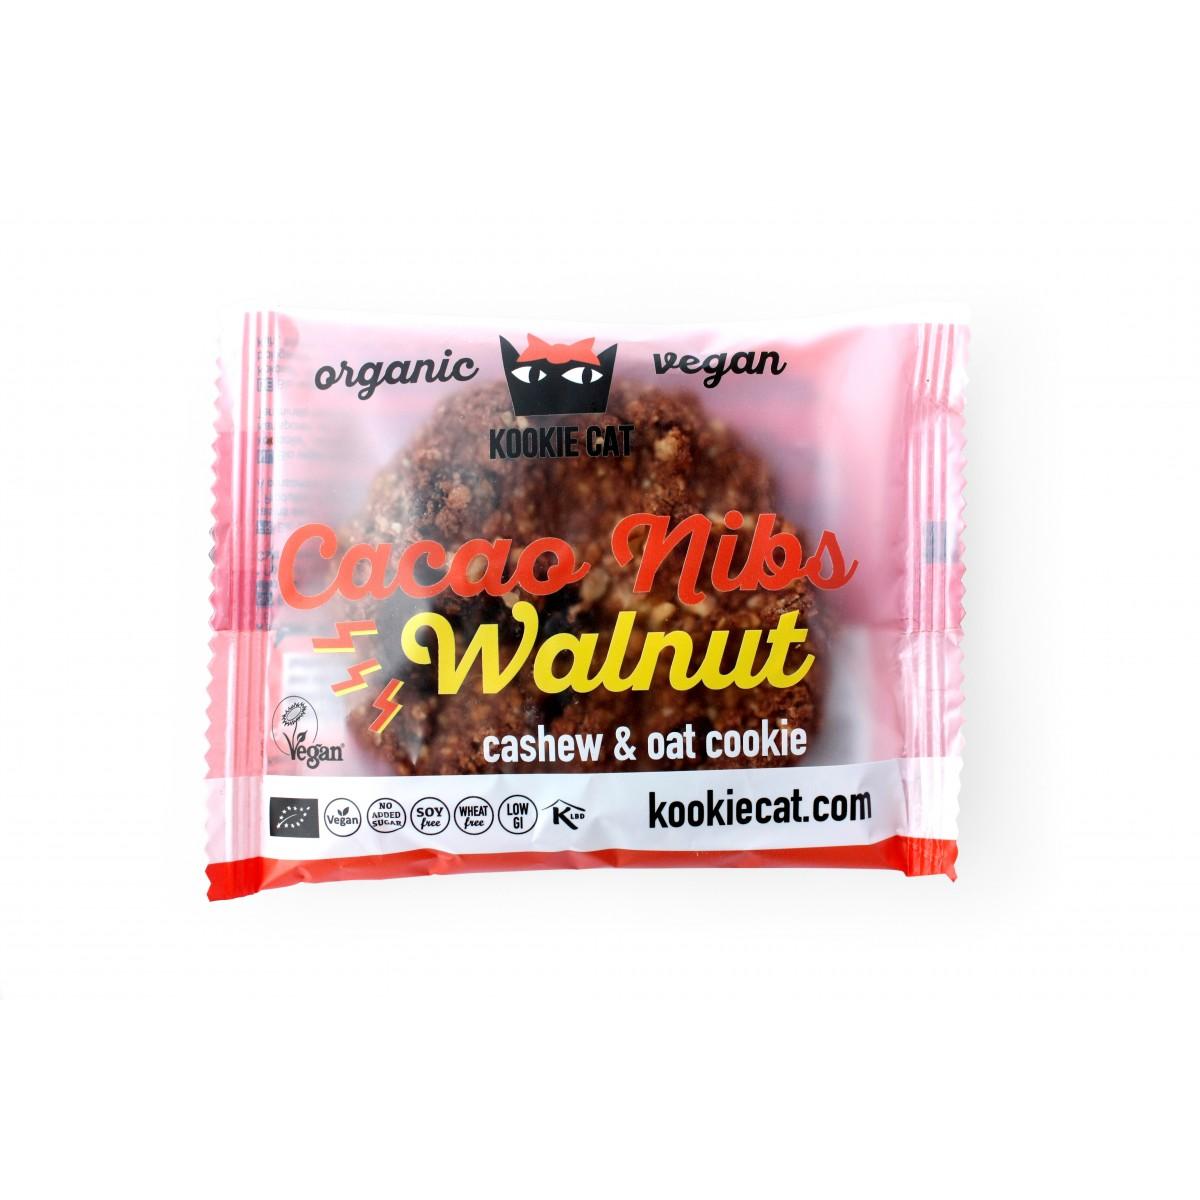 Cacao Nibs Walnut (T.H.T. 24-01-20)